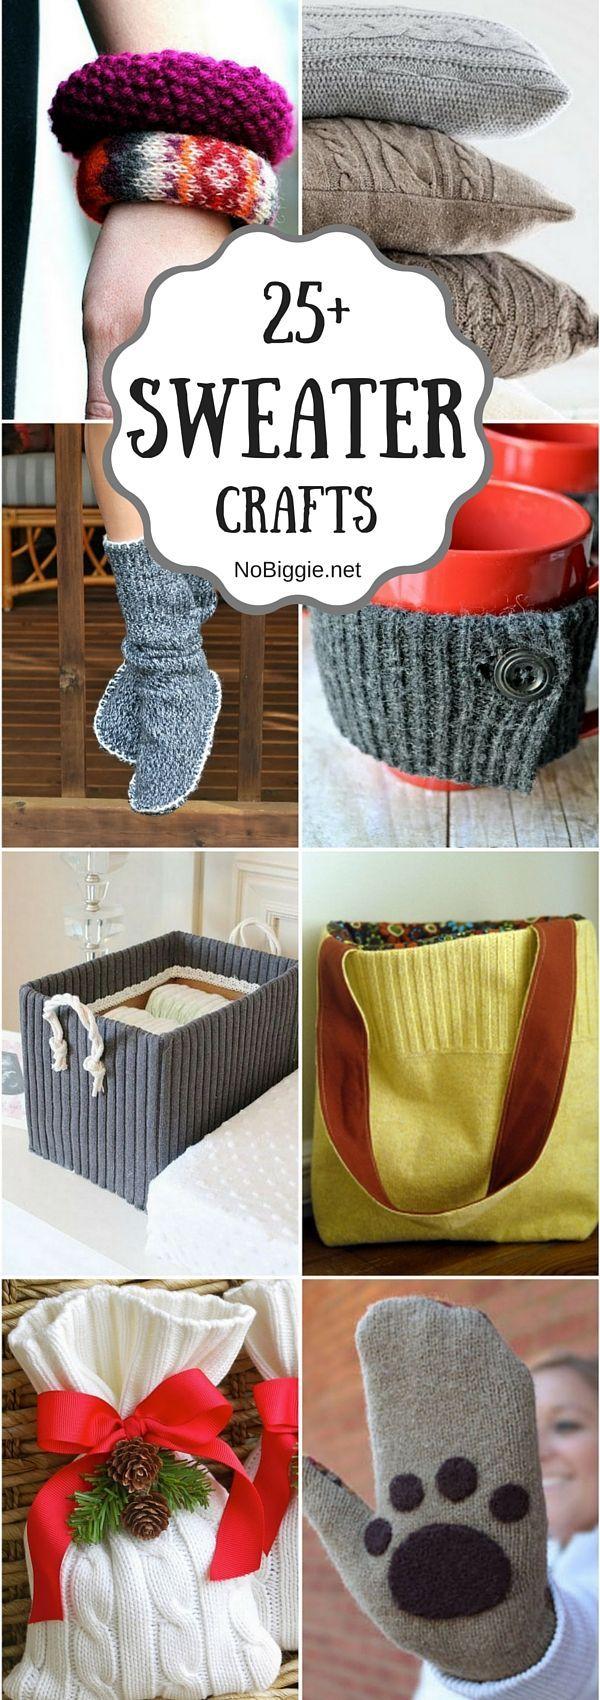 25+ sweater crafts   http://NoBiggie.net